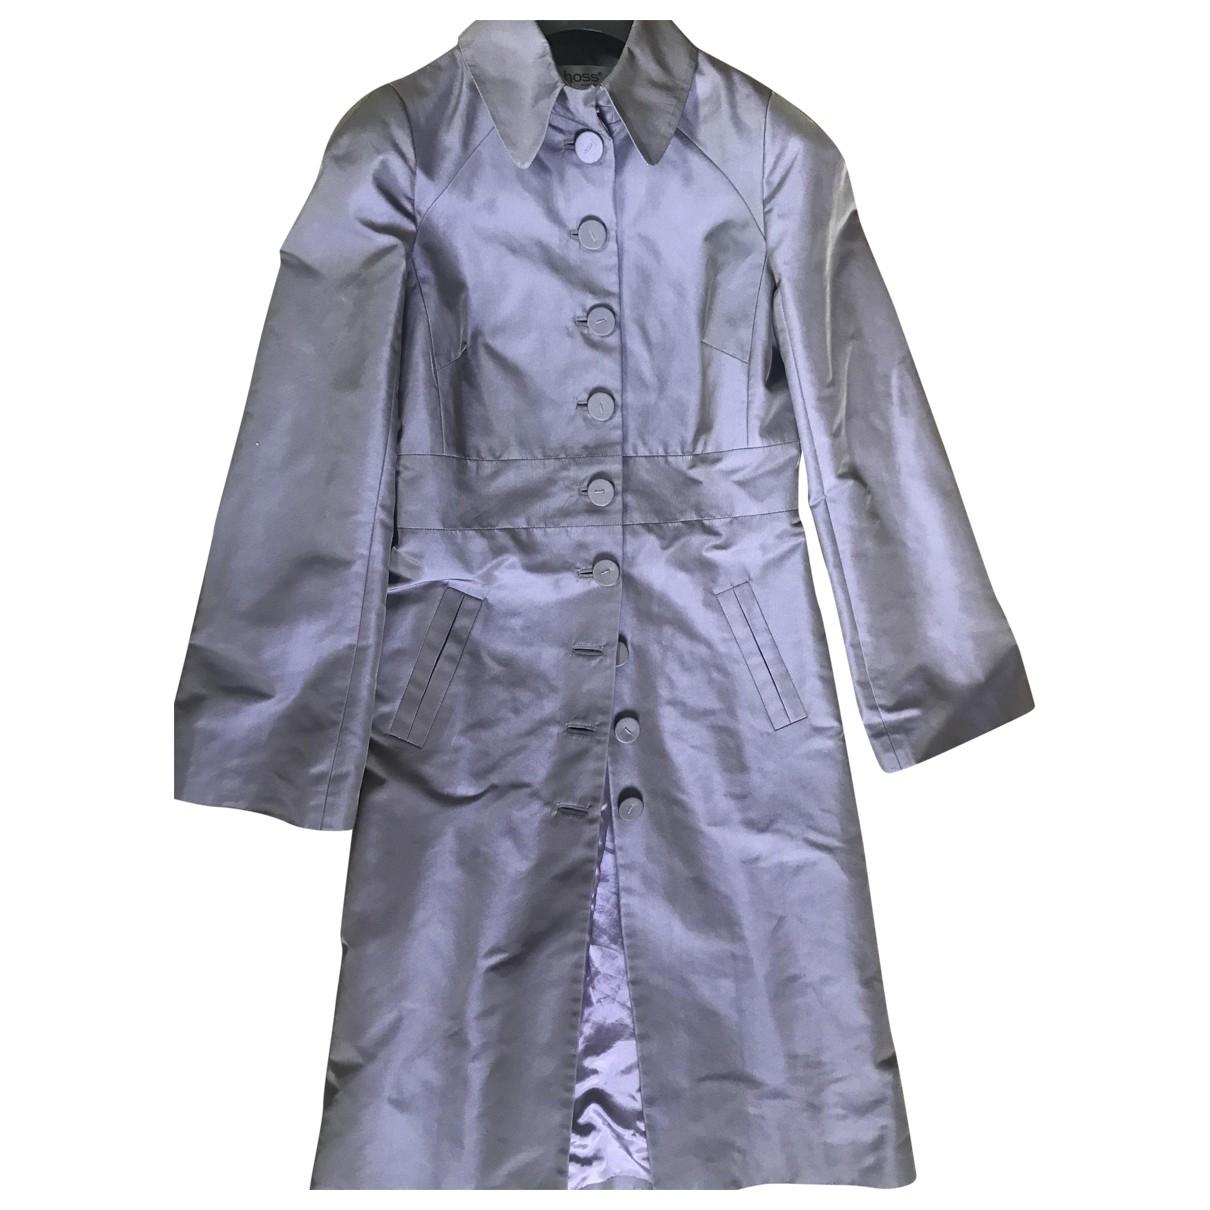 Hoss Intropia \N Purple coat for Women 42 IT